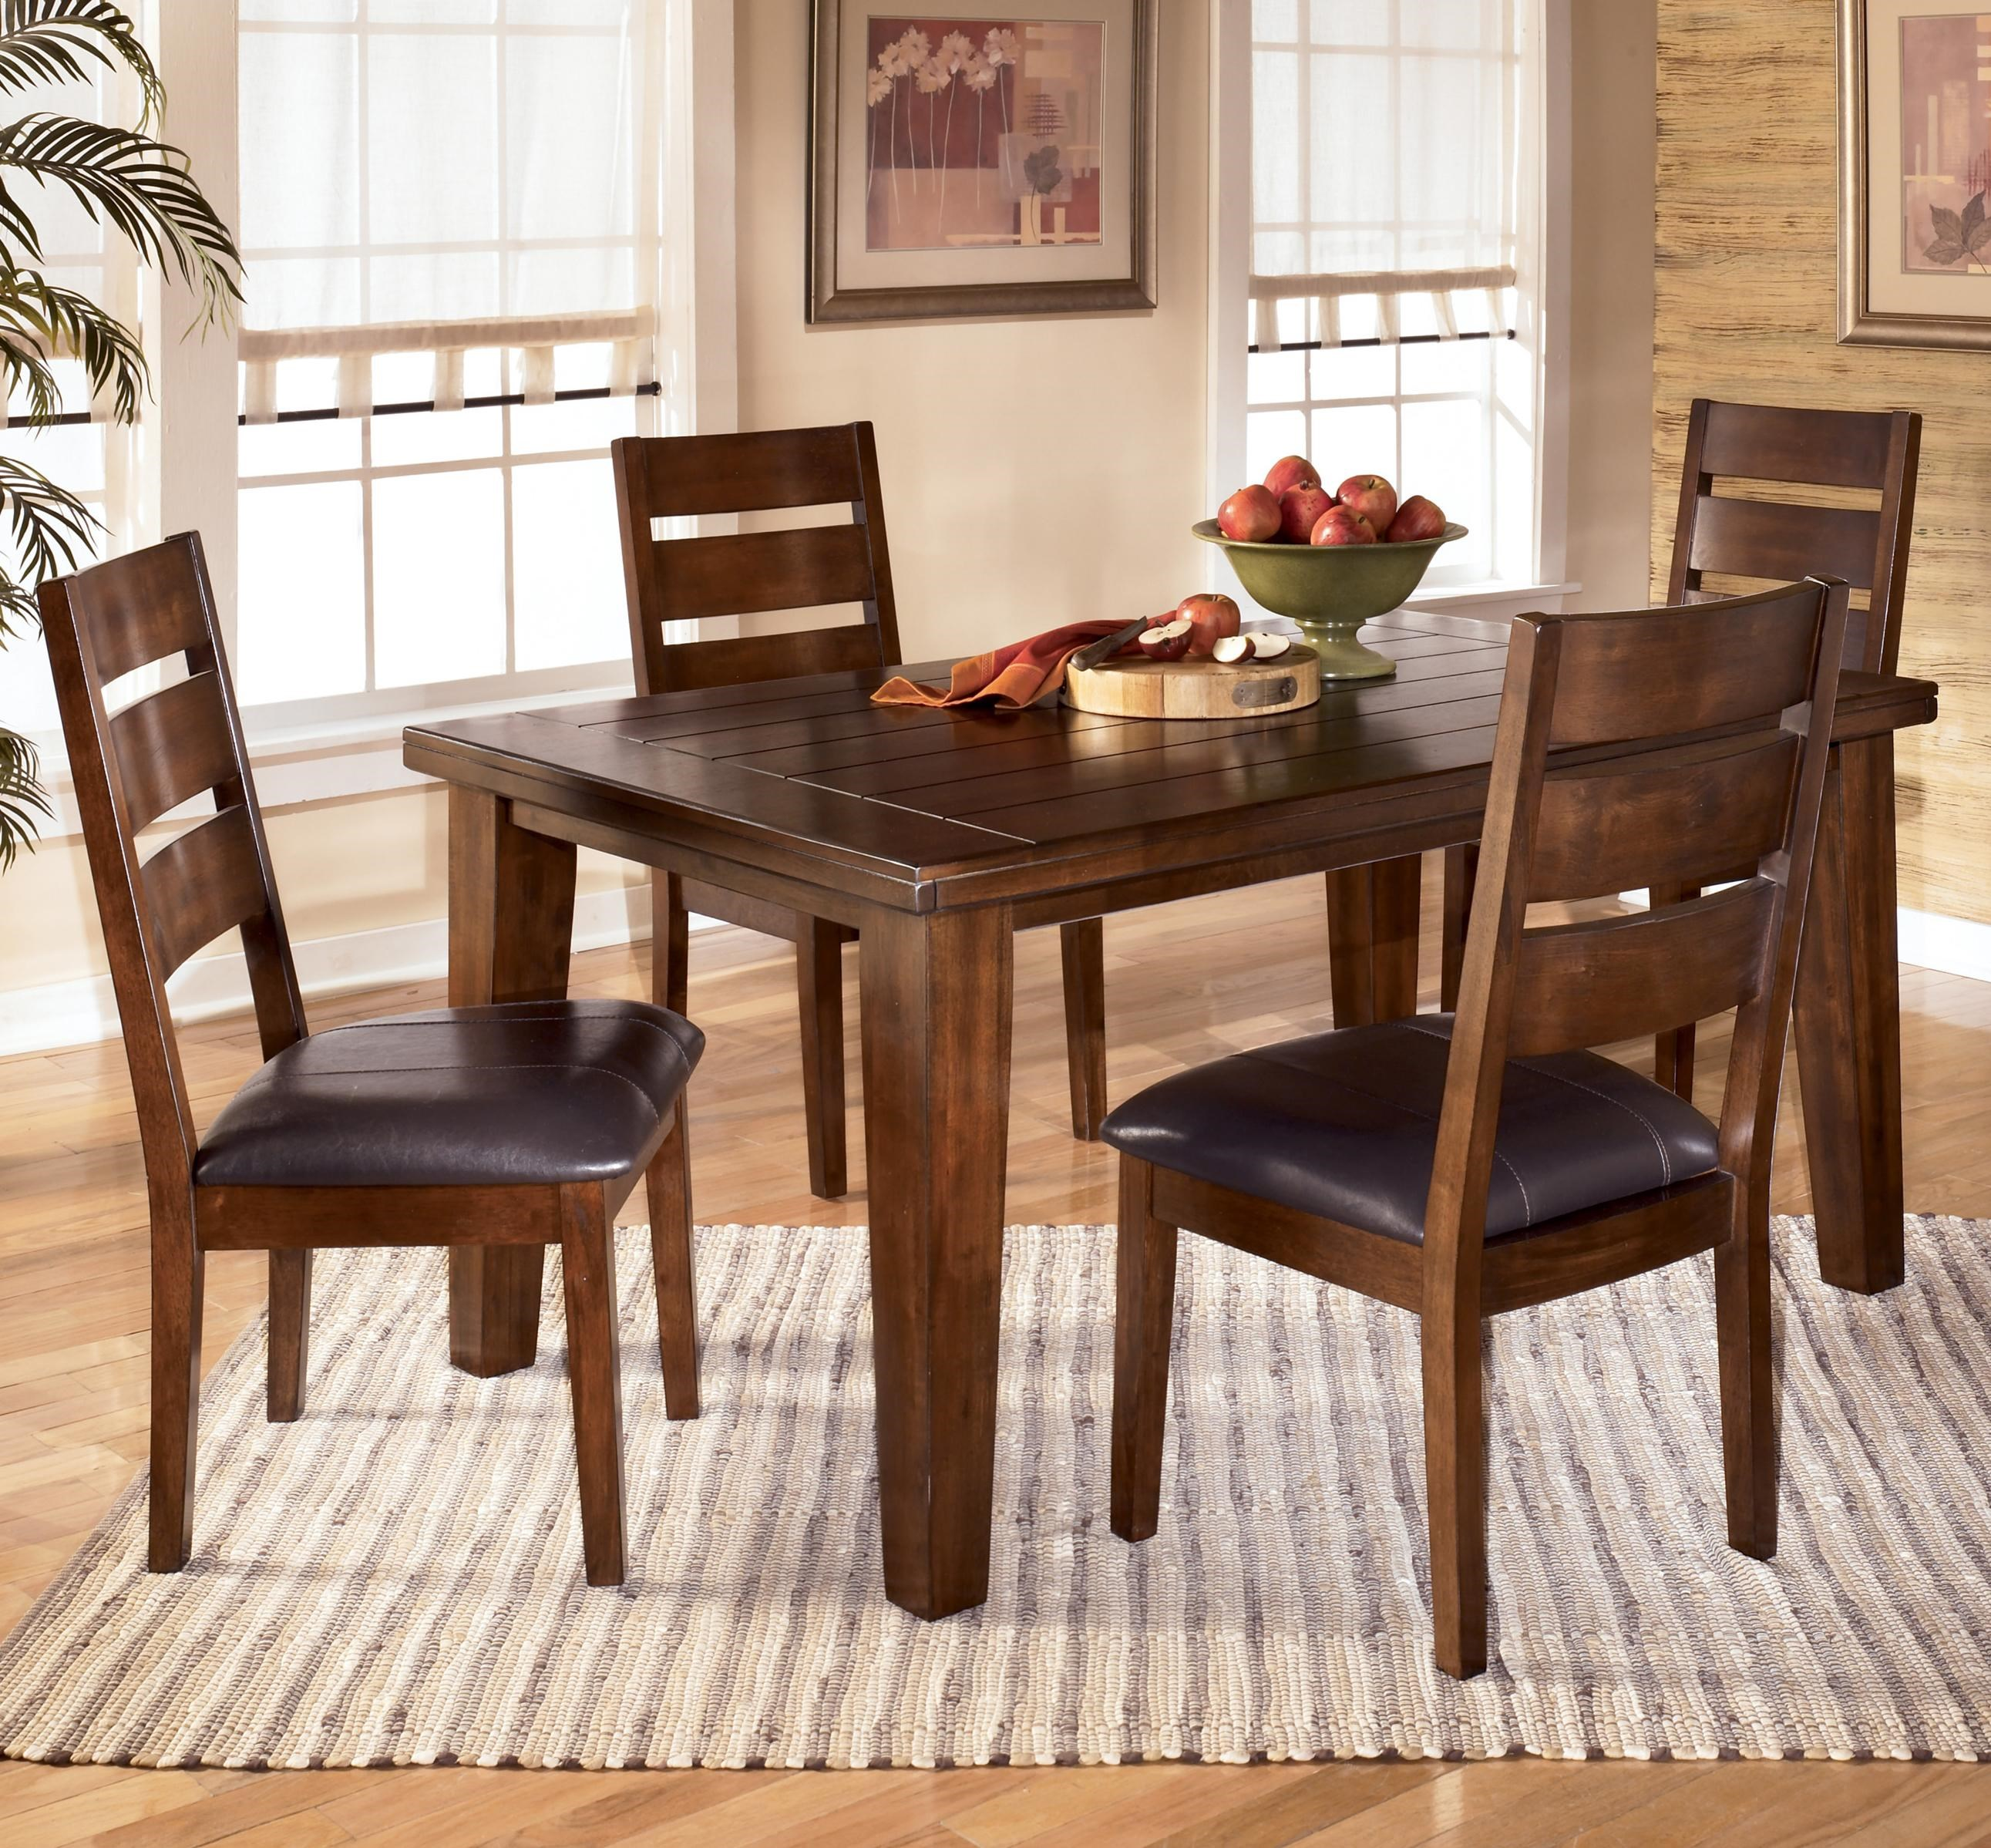 Elegant Signature Design By Ashley Larchmont 5 Piece Rectangular Dining Table Set